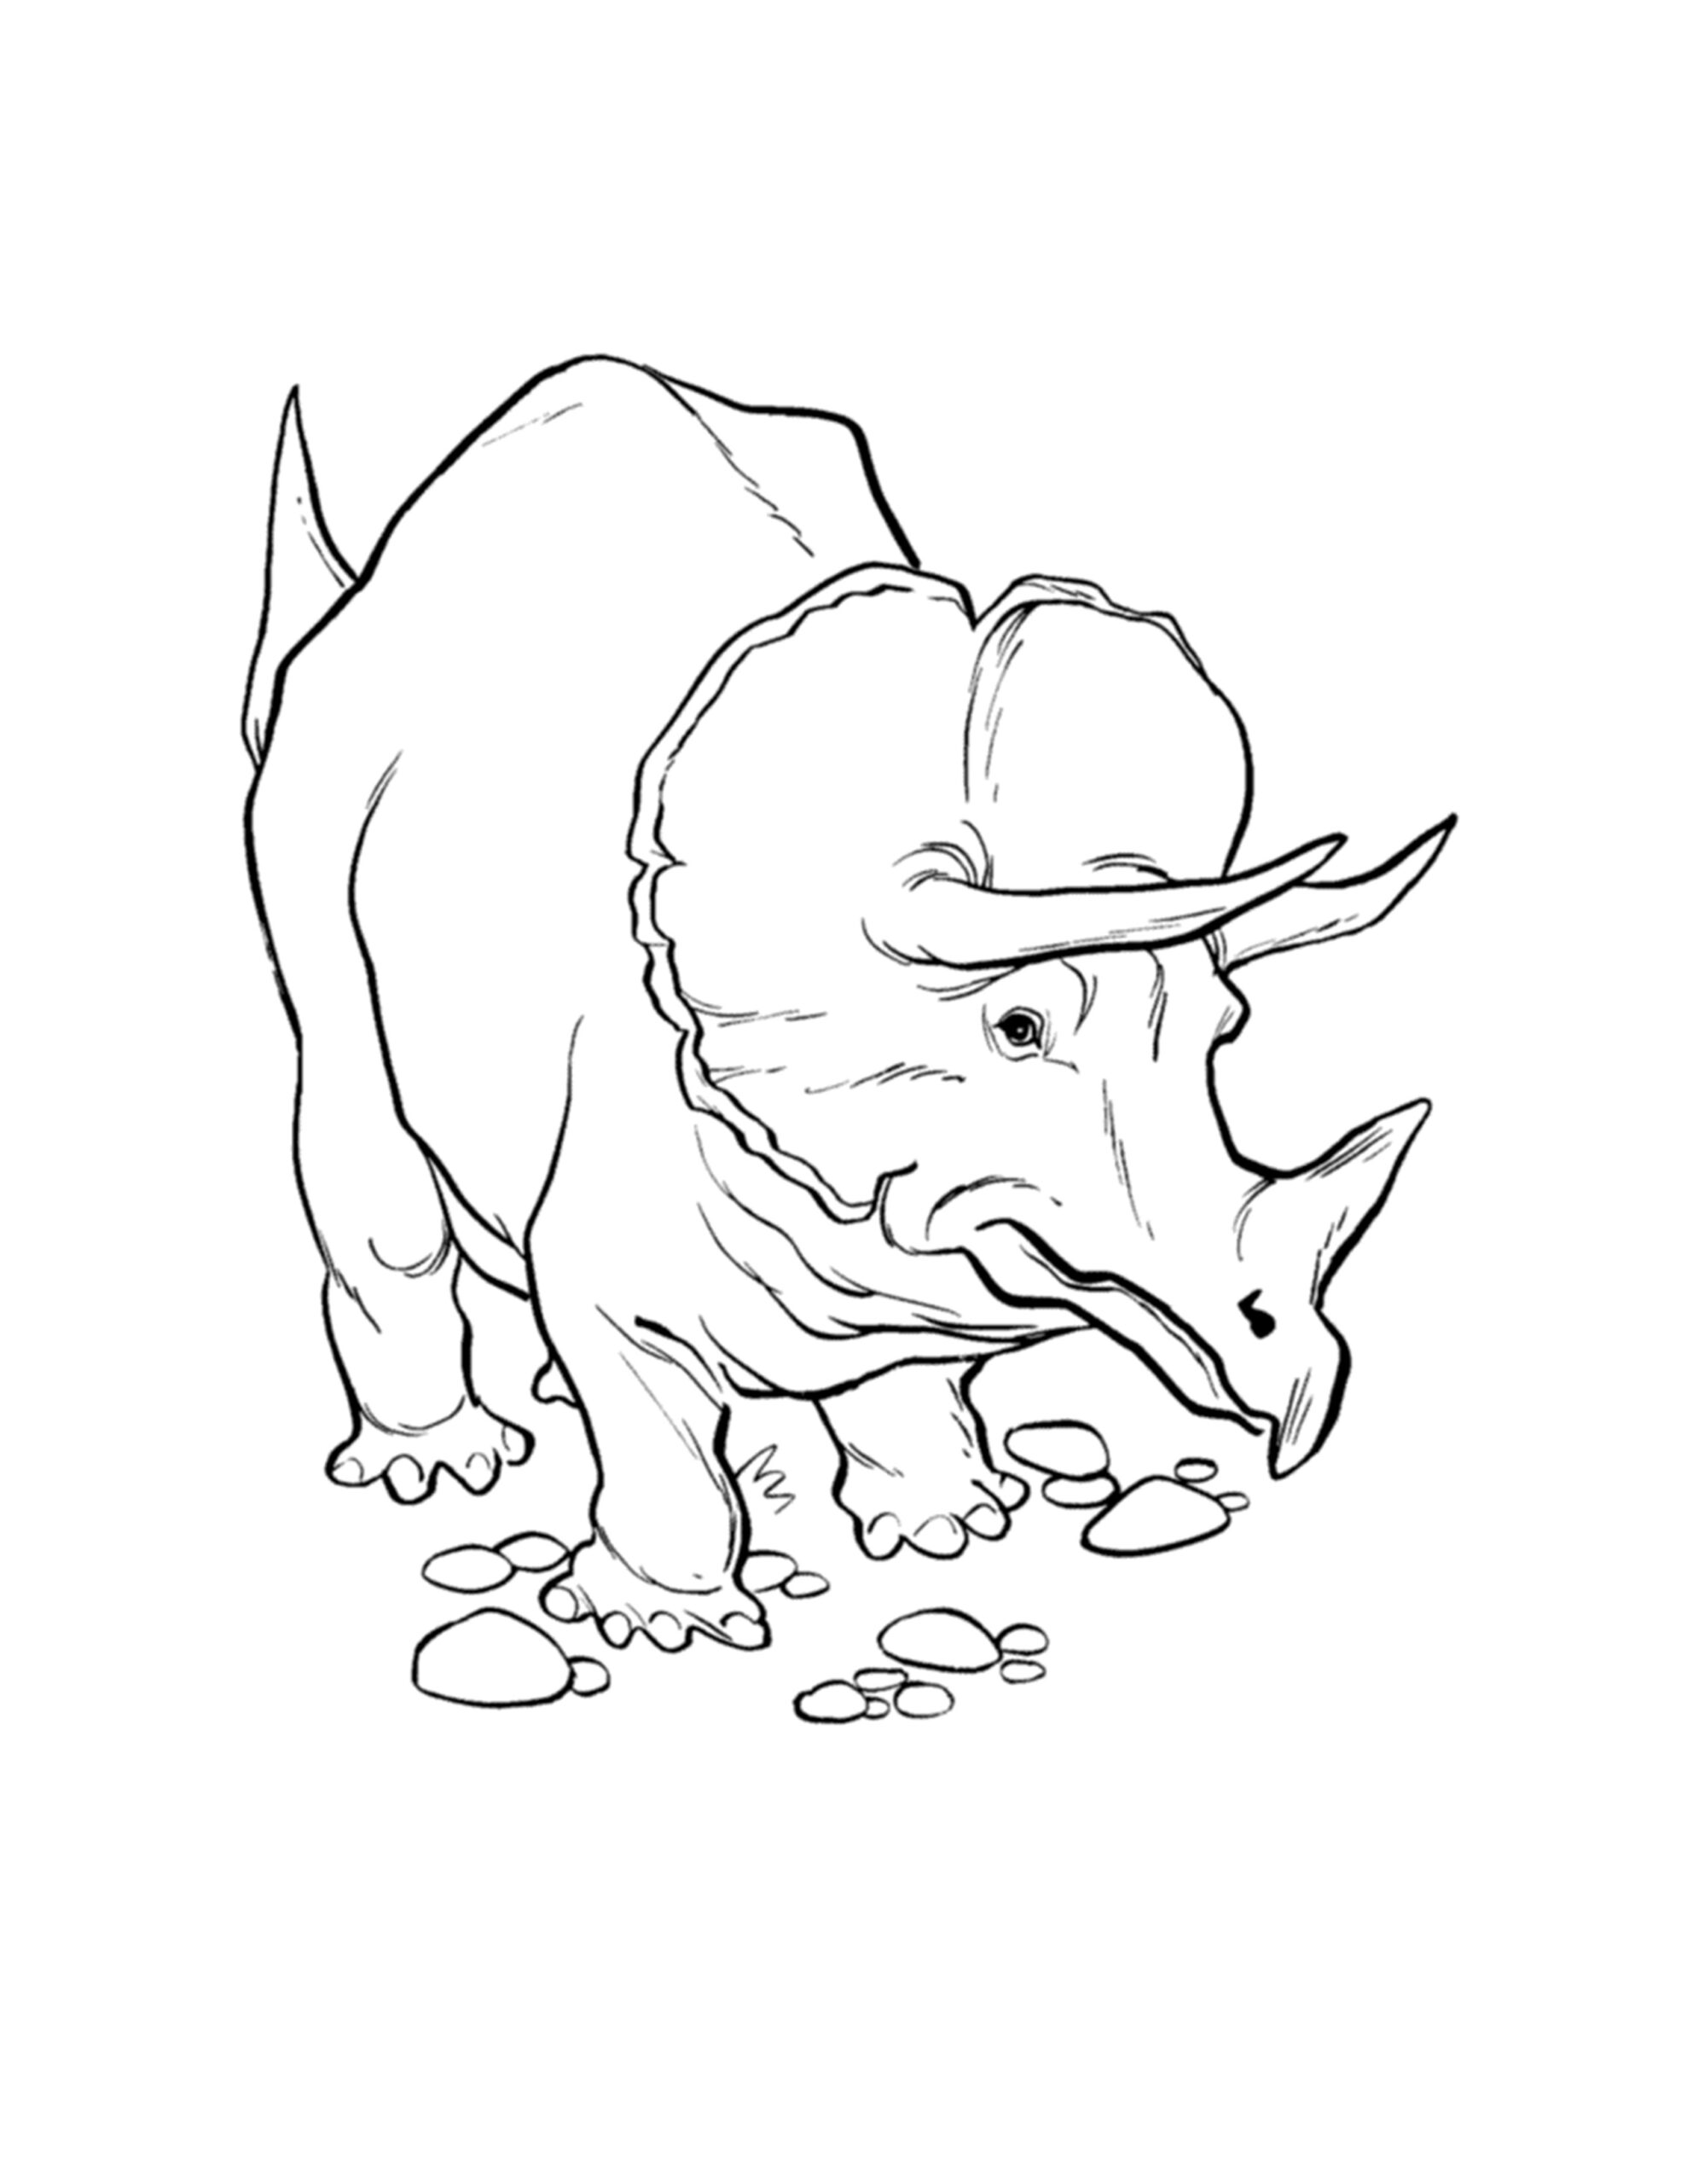 dinosaurus inkleuren tekening